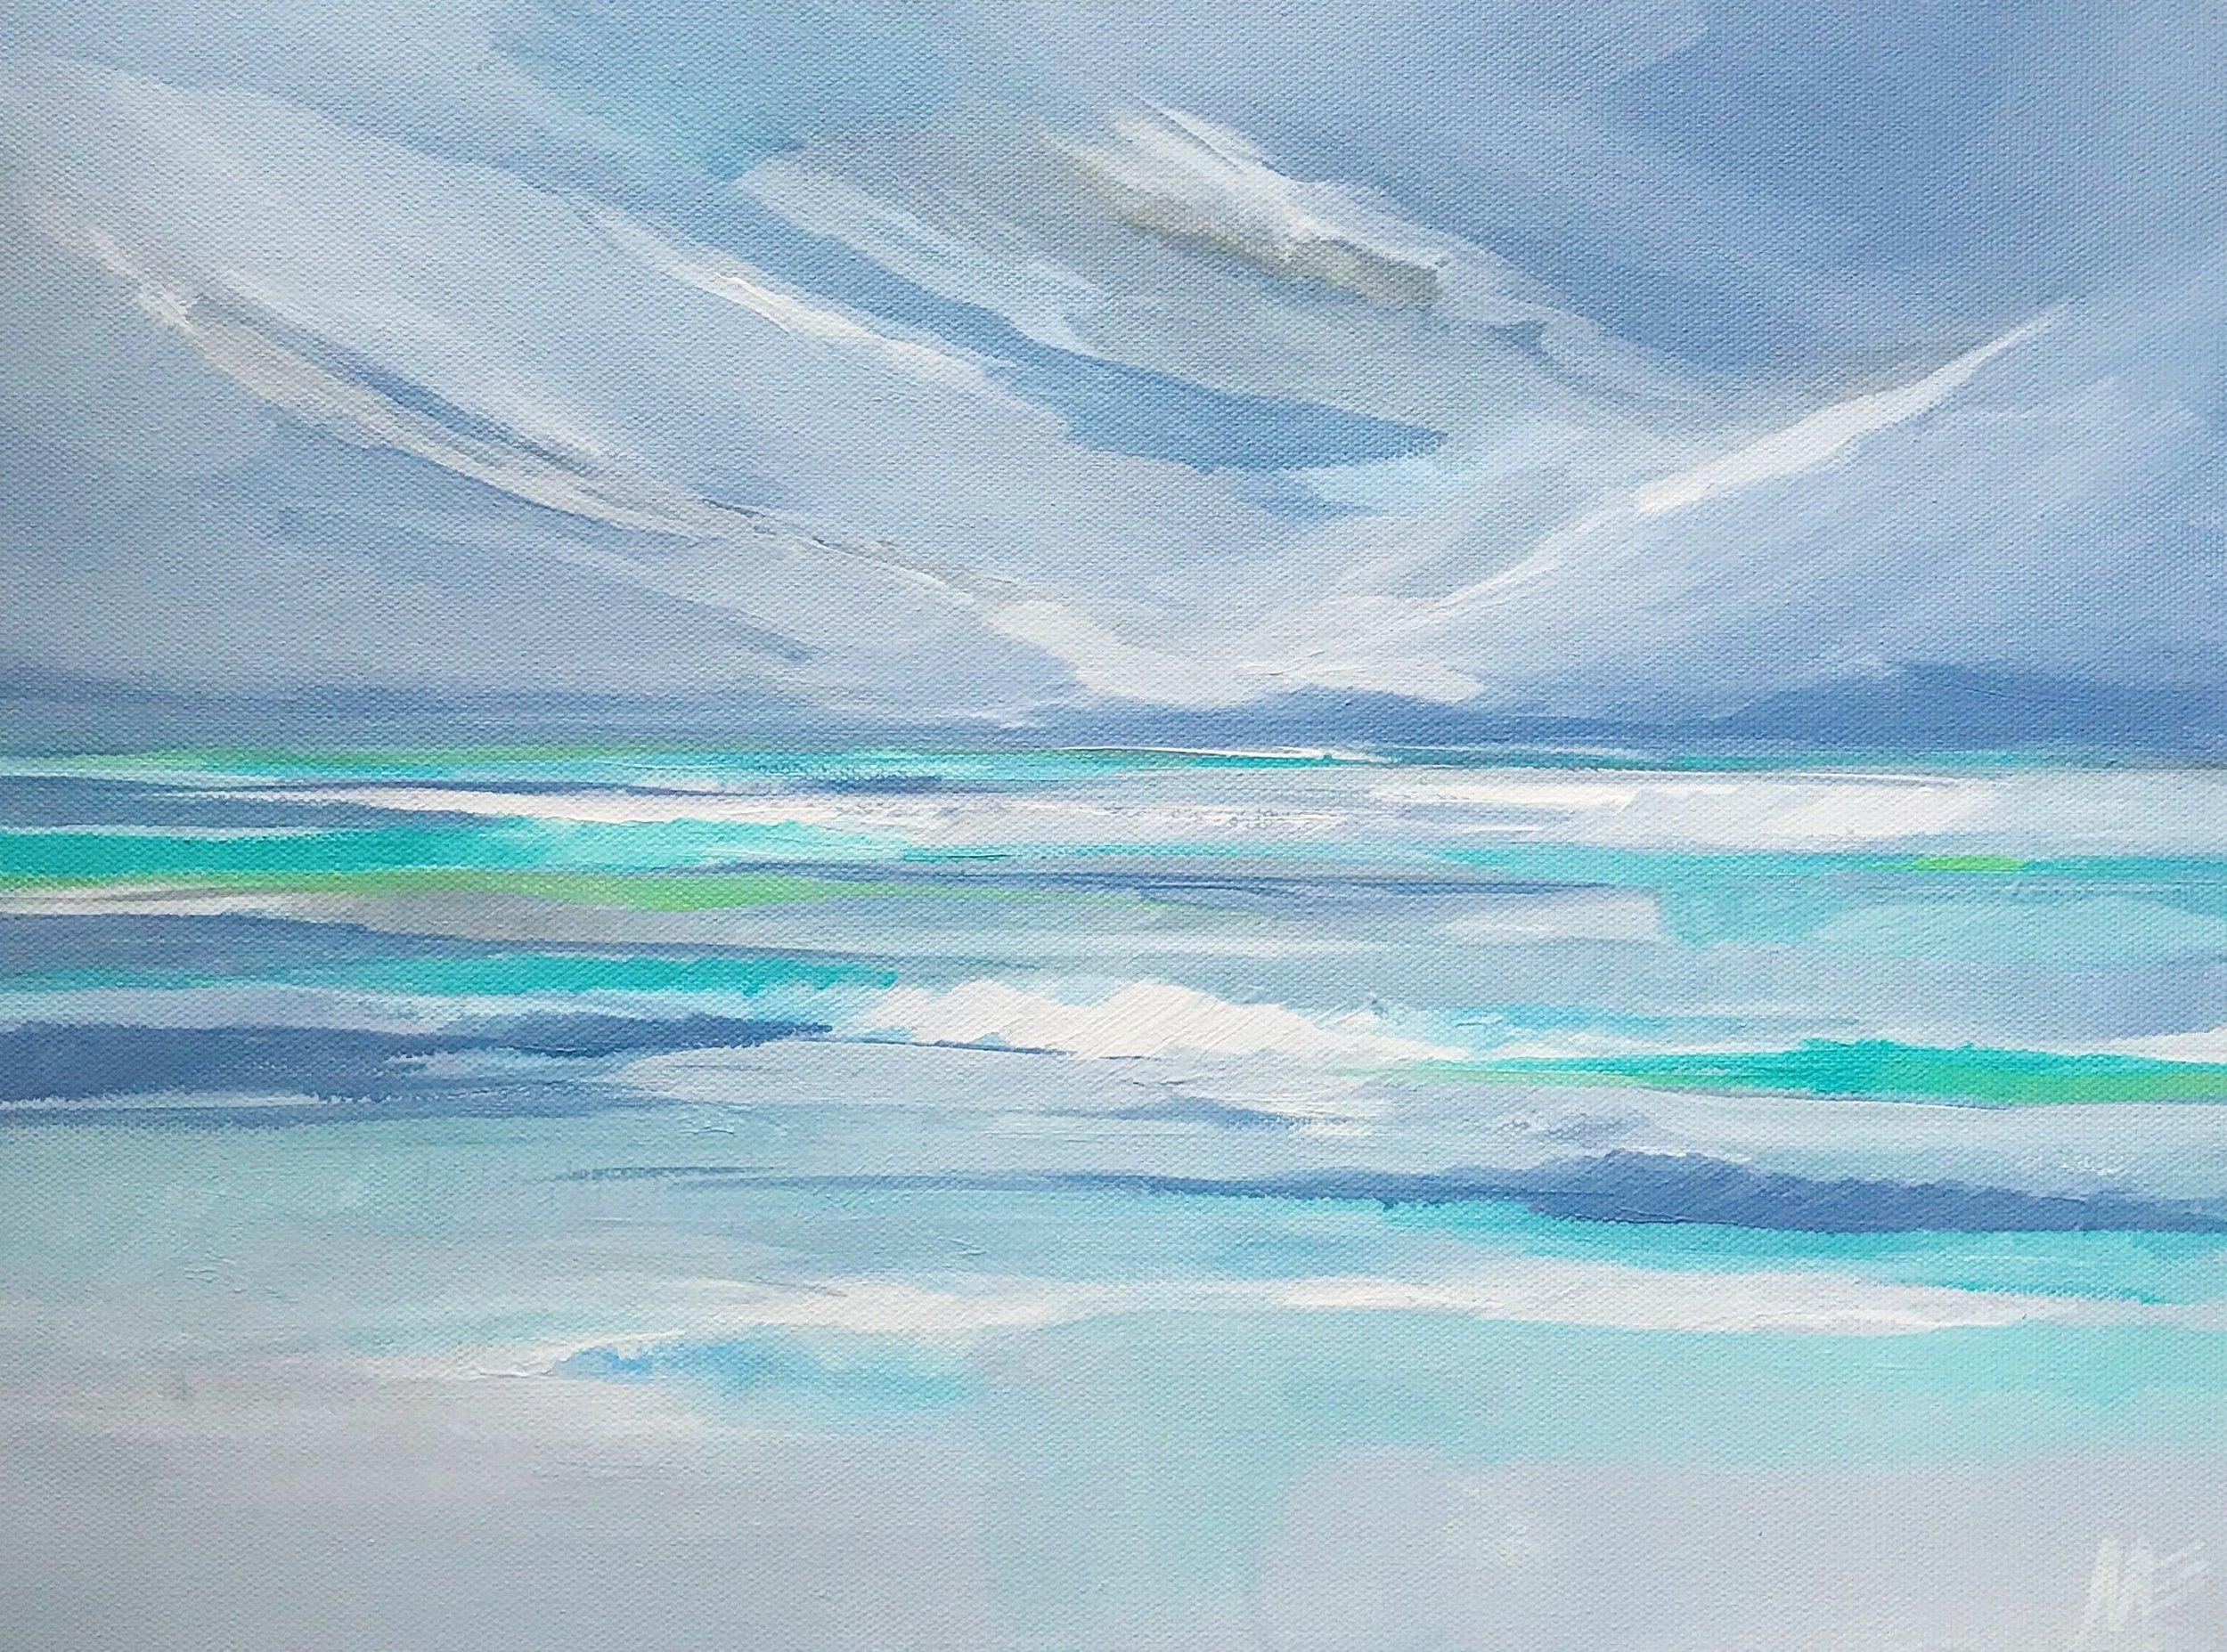 """Calm Seas"" by Megan Elizabeth of Art by Megan"